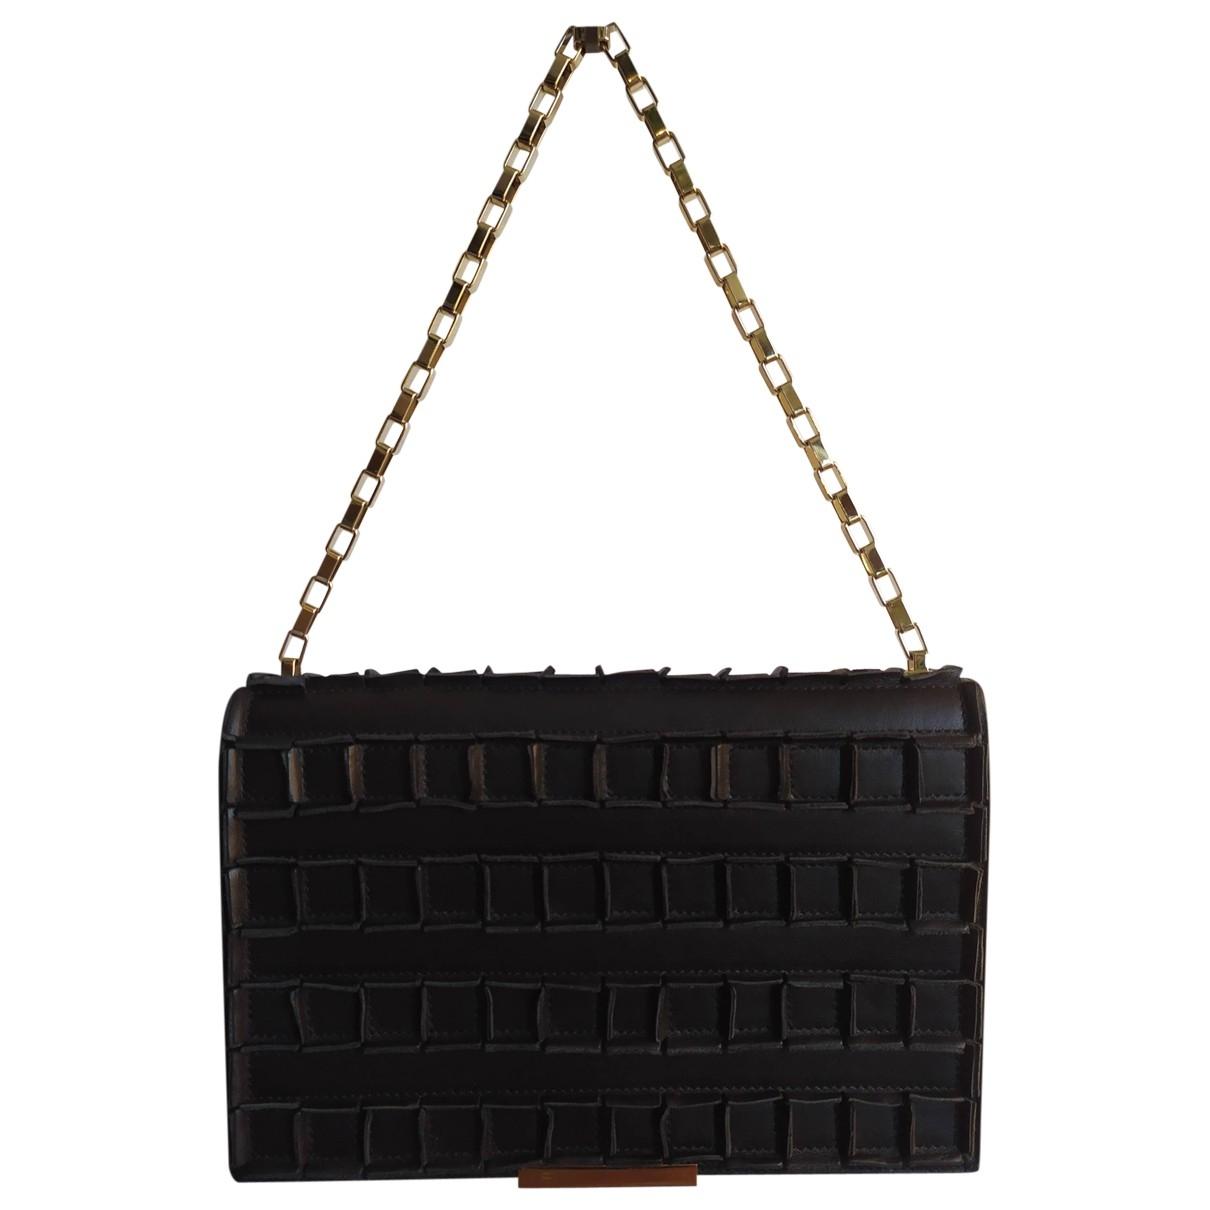 Tomasini \N Handtasche in  Schwarz Leder